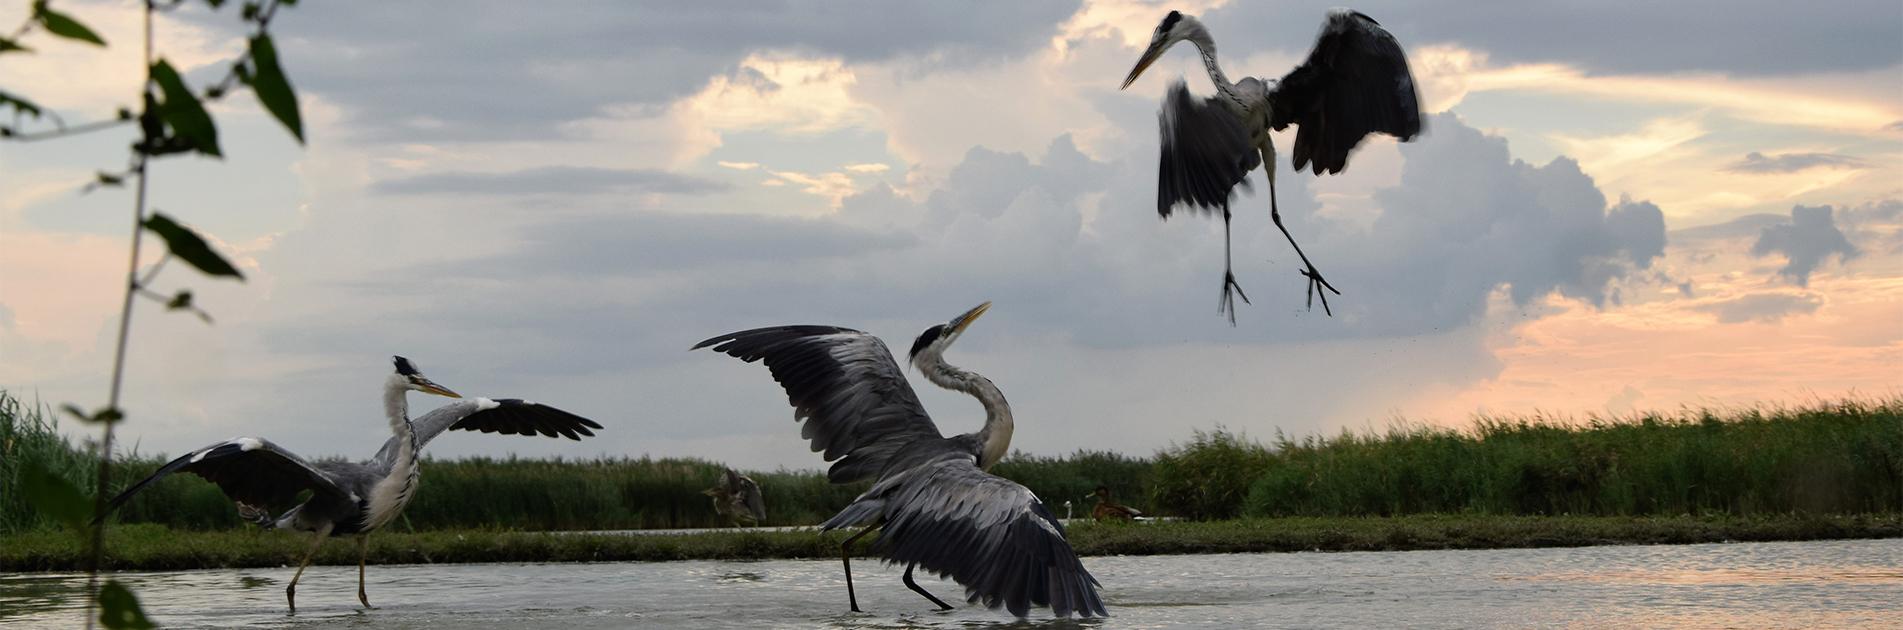 Fuglevildt i Ungarn